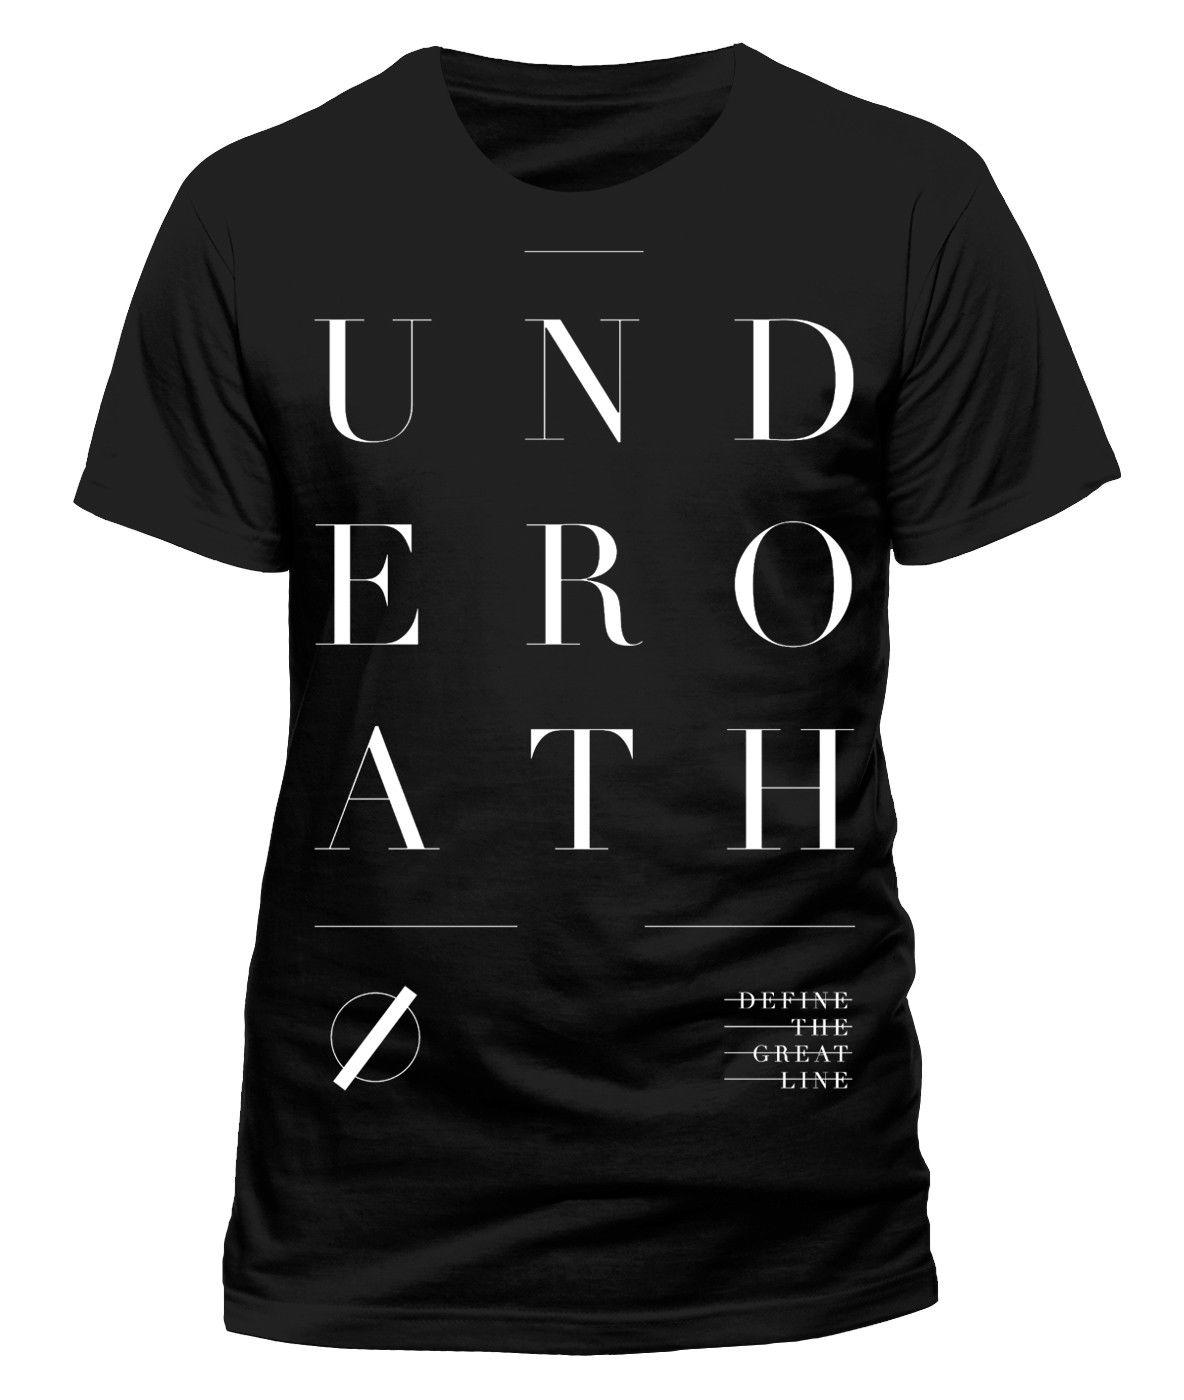 Underoath 'Define' T-shirt-Neuf et